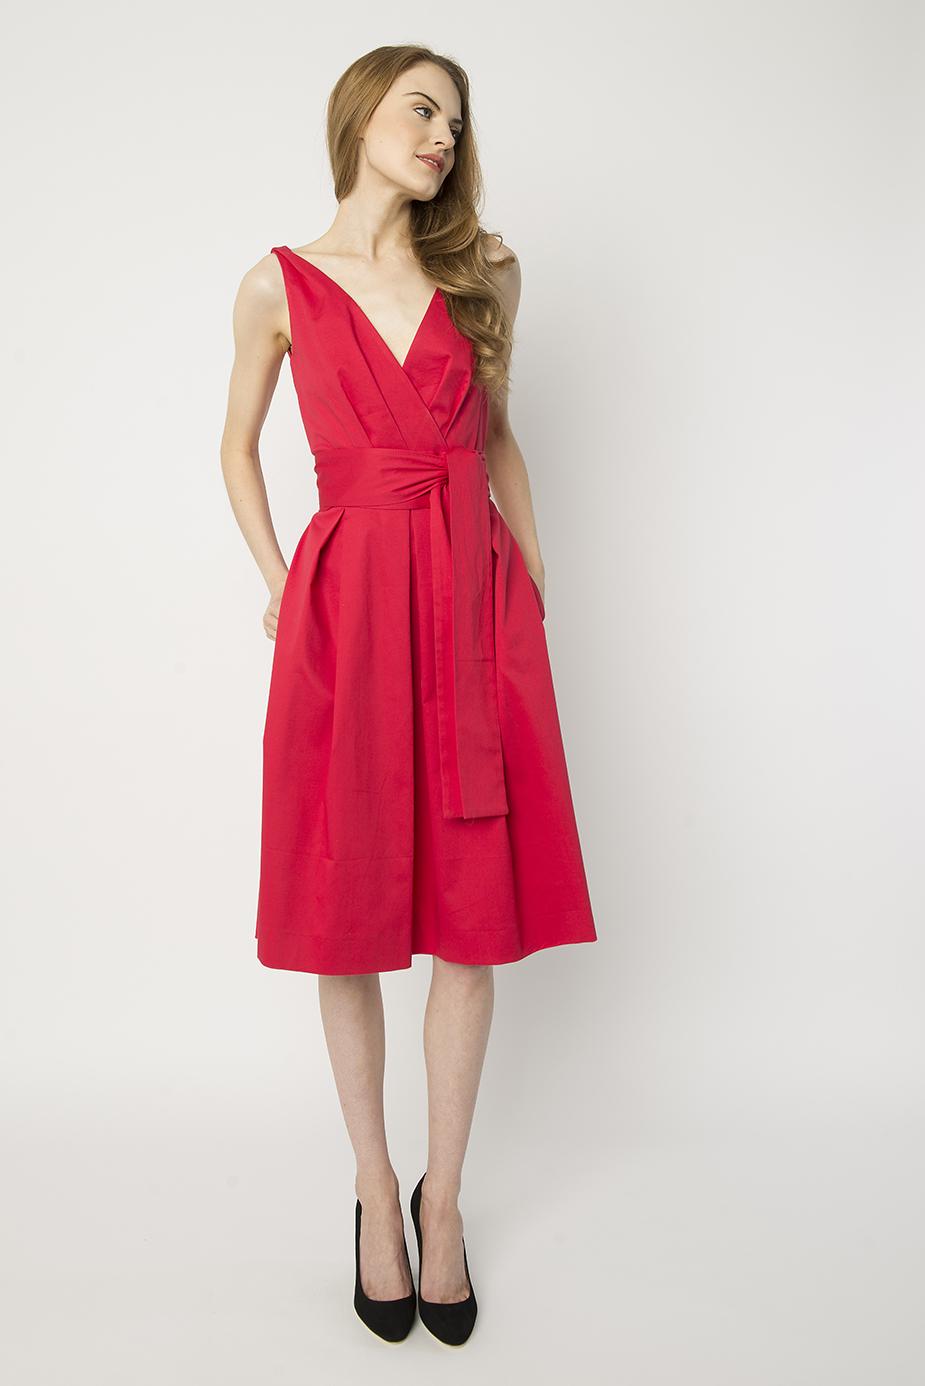 068cd62ed73 Berry Garden Party Dress - Suzy Perette